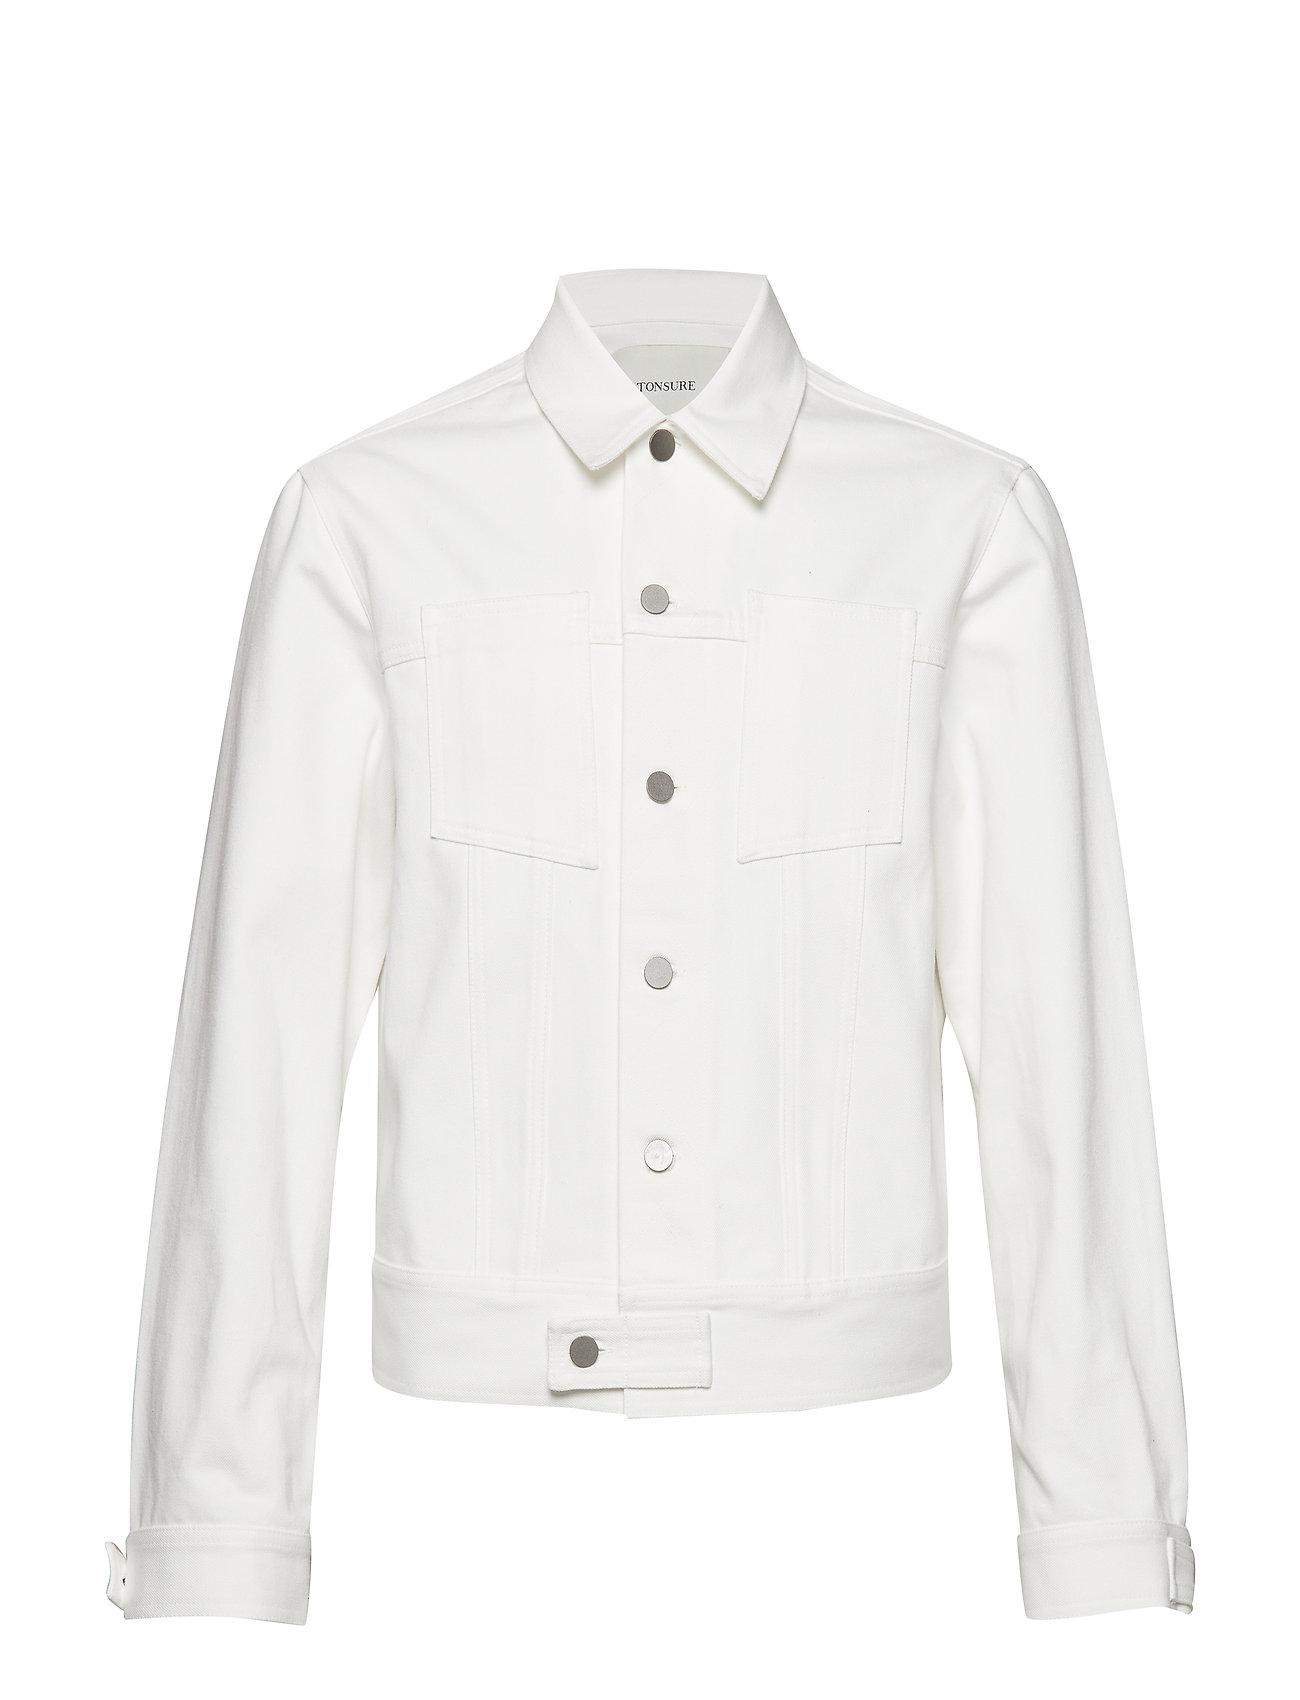 Tonsure Denim Jacket - WHITE